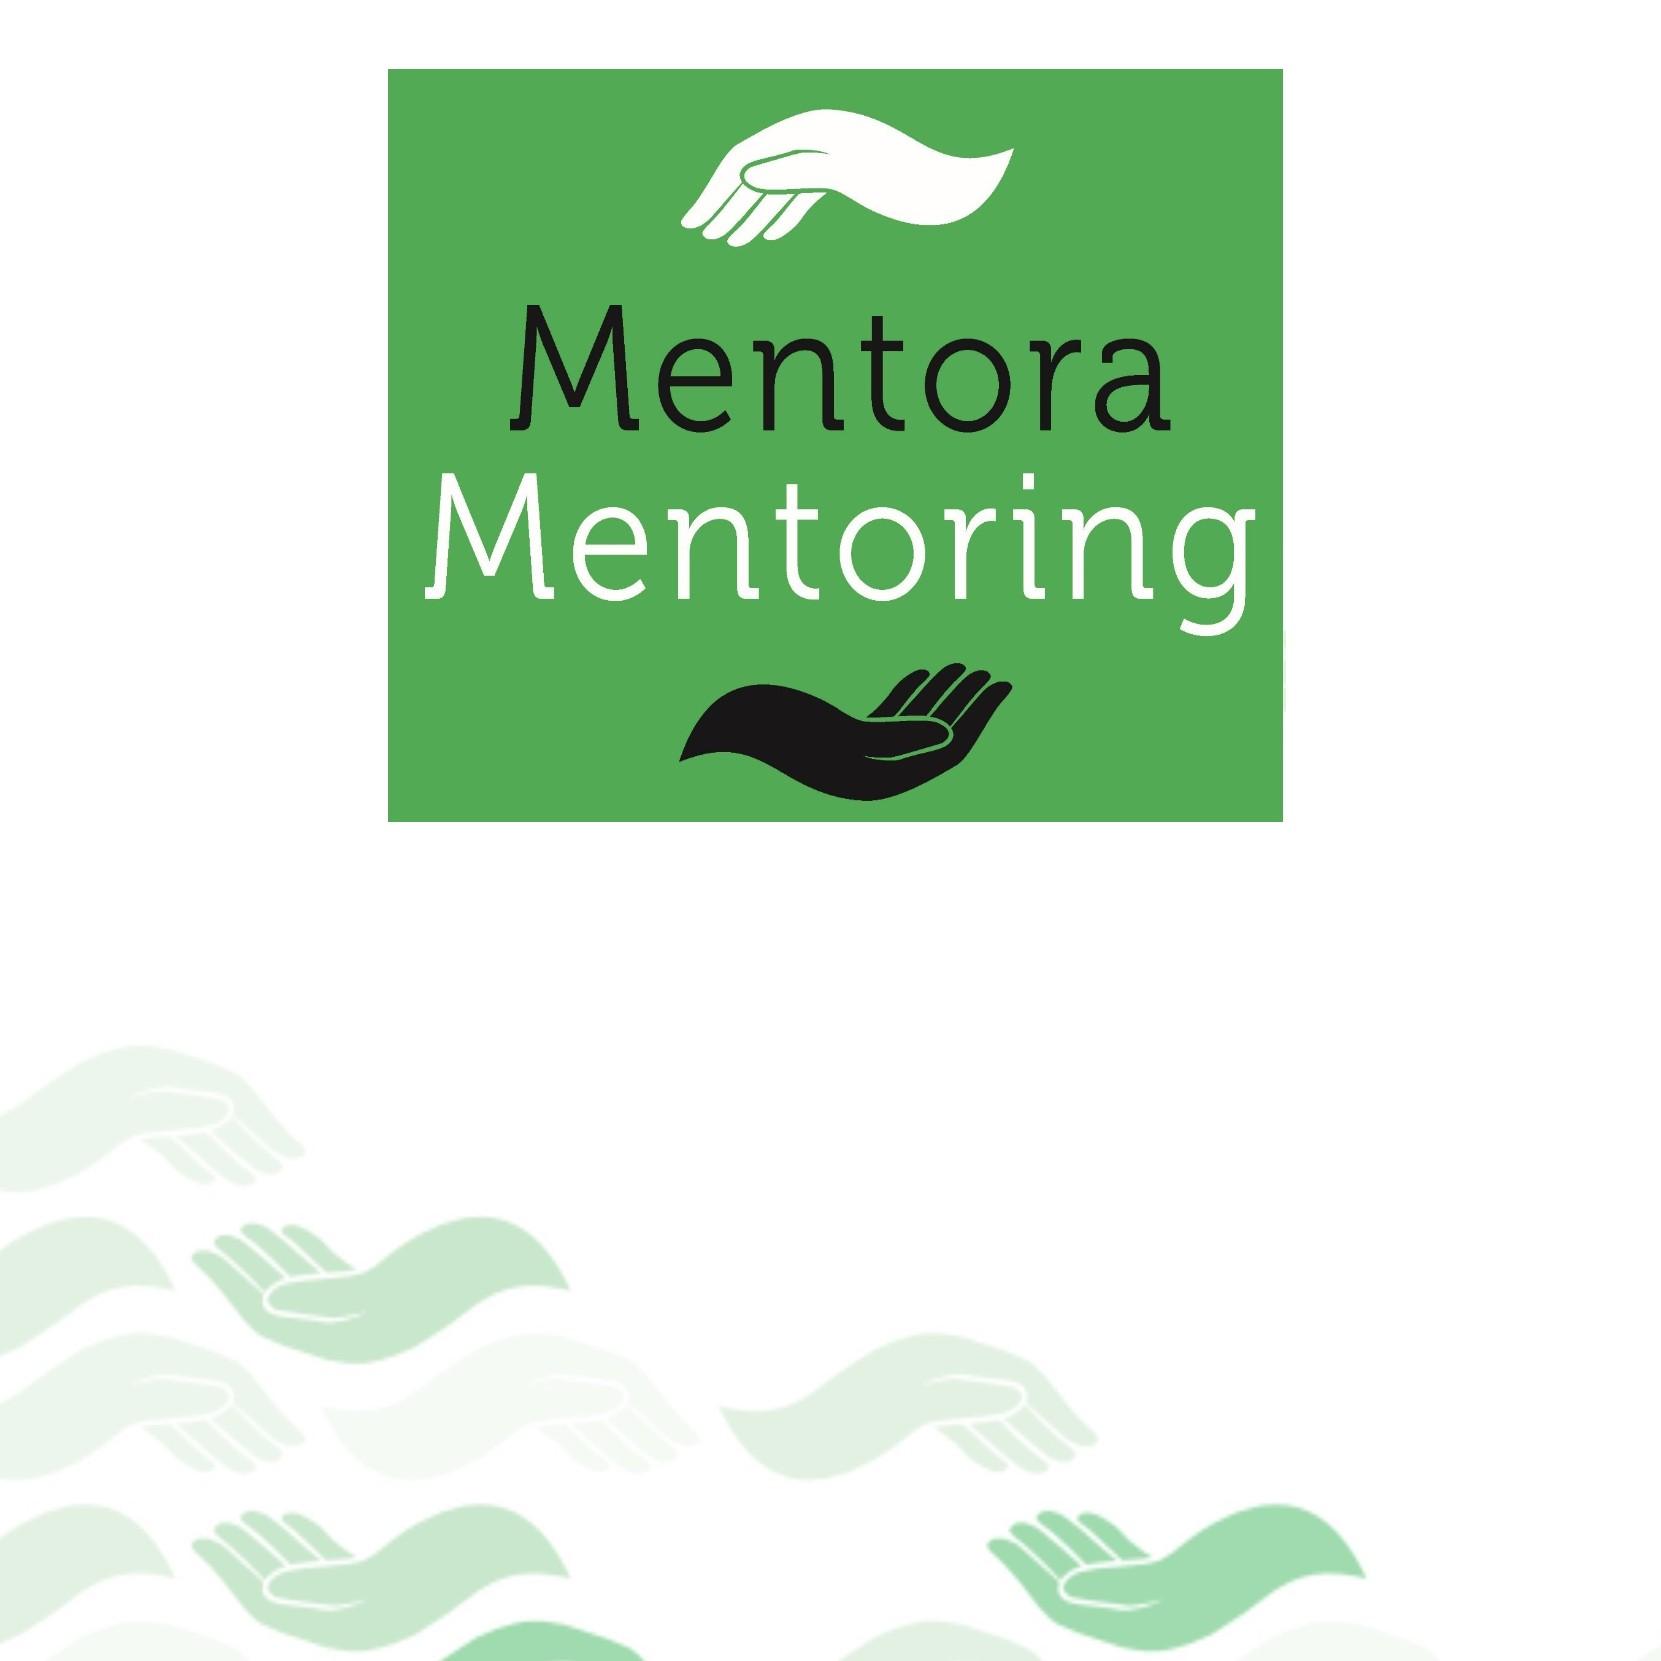 Mentora Mentoring